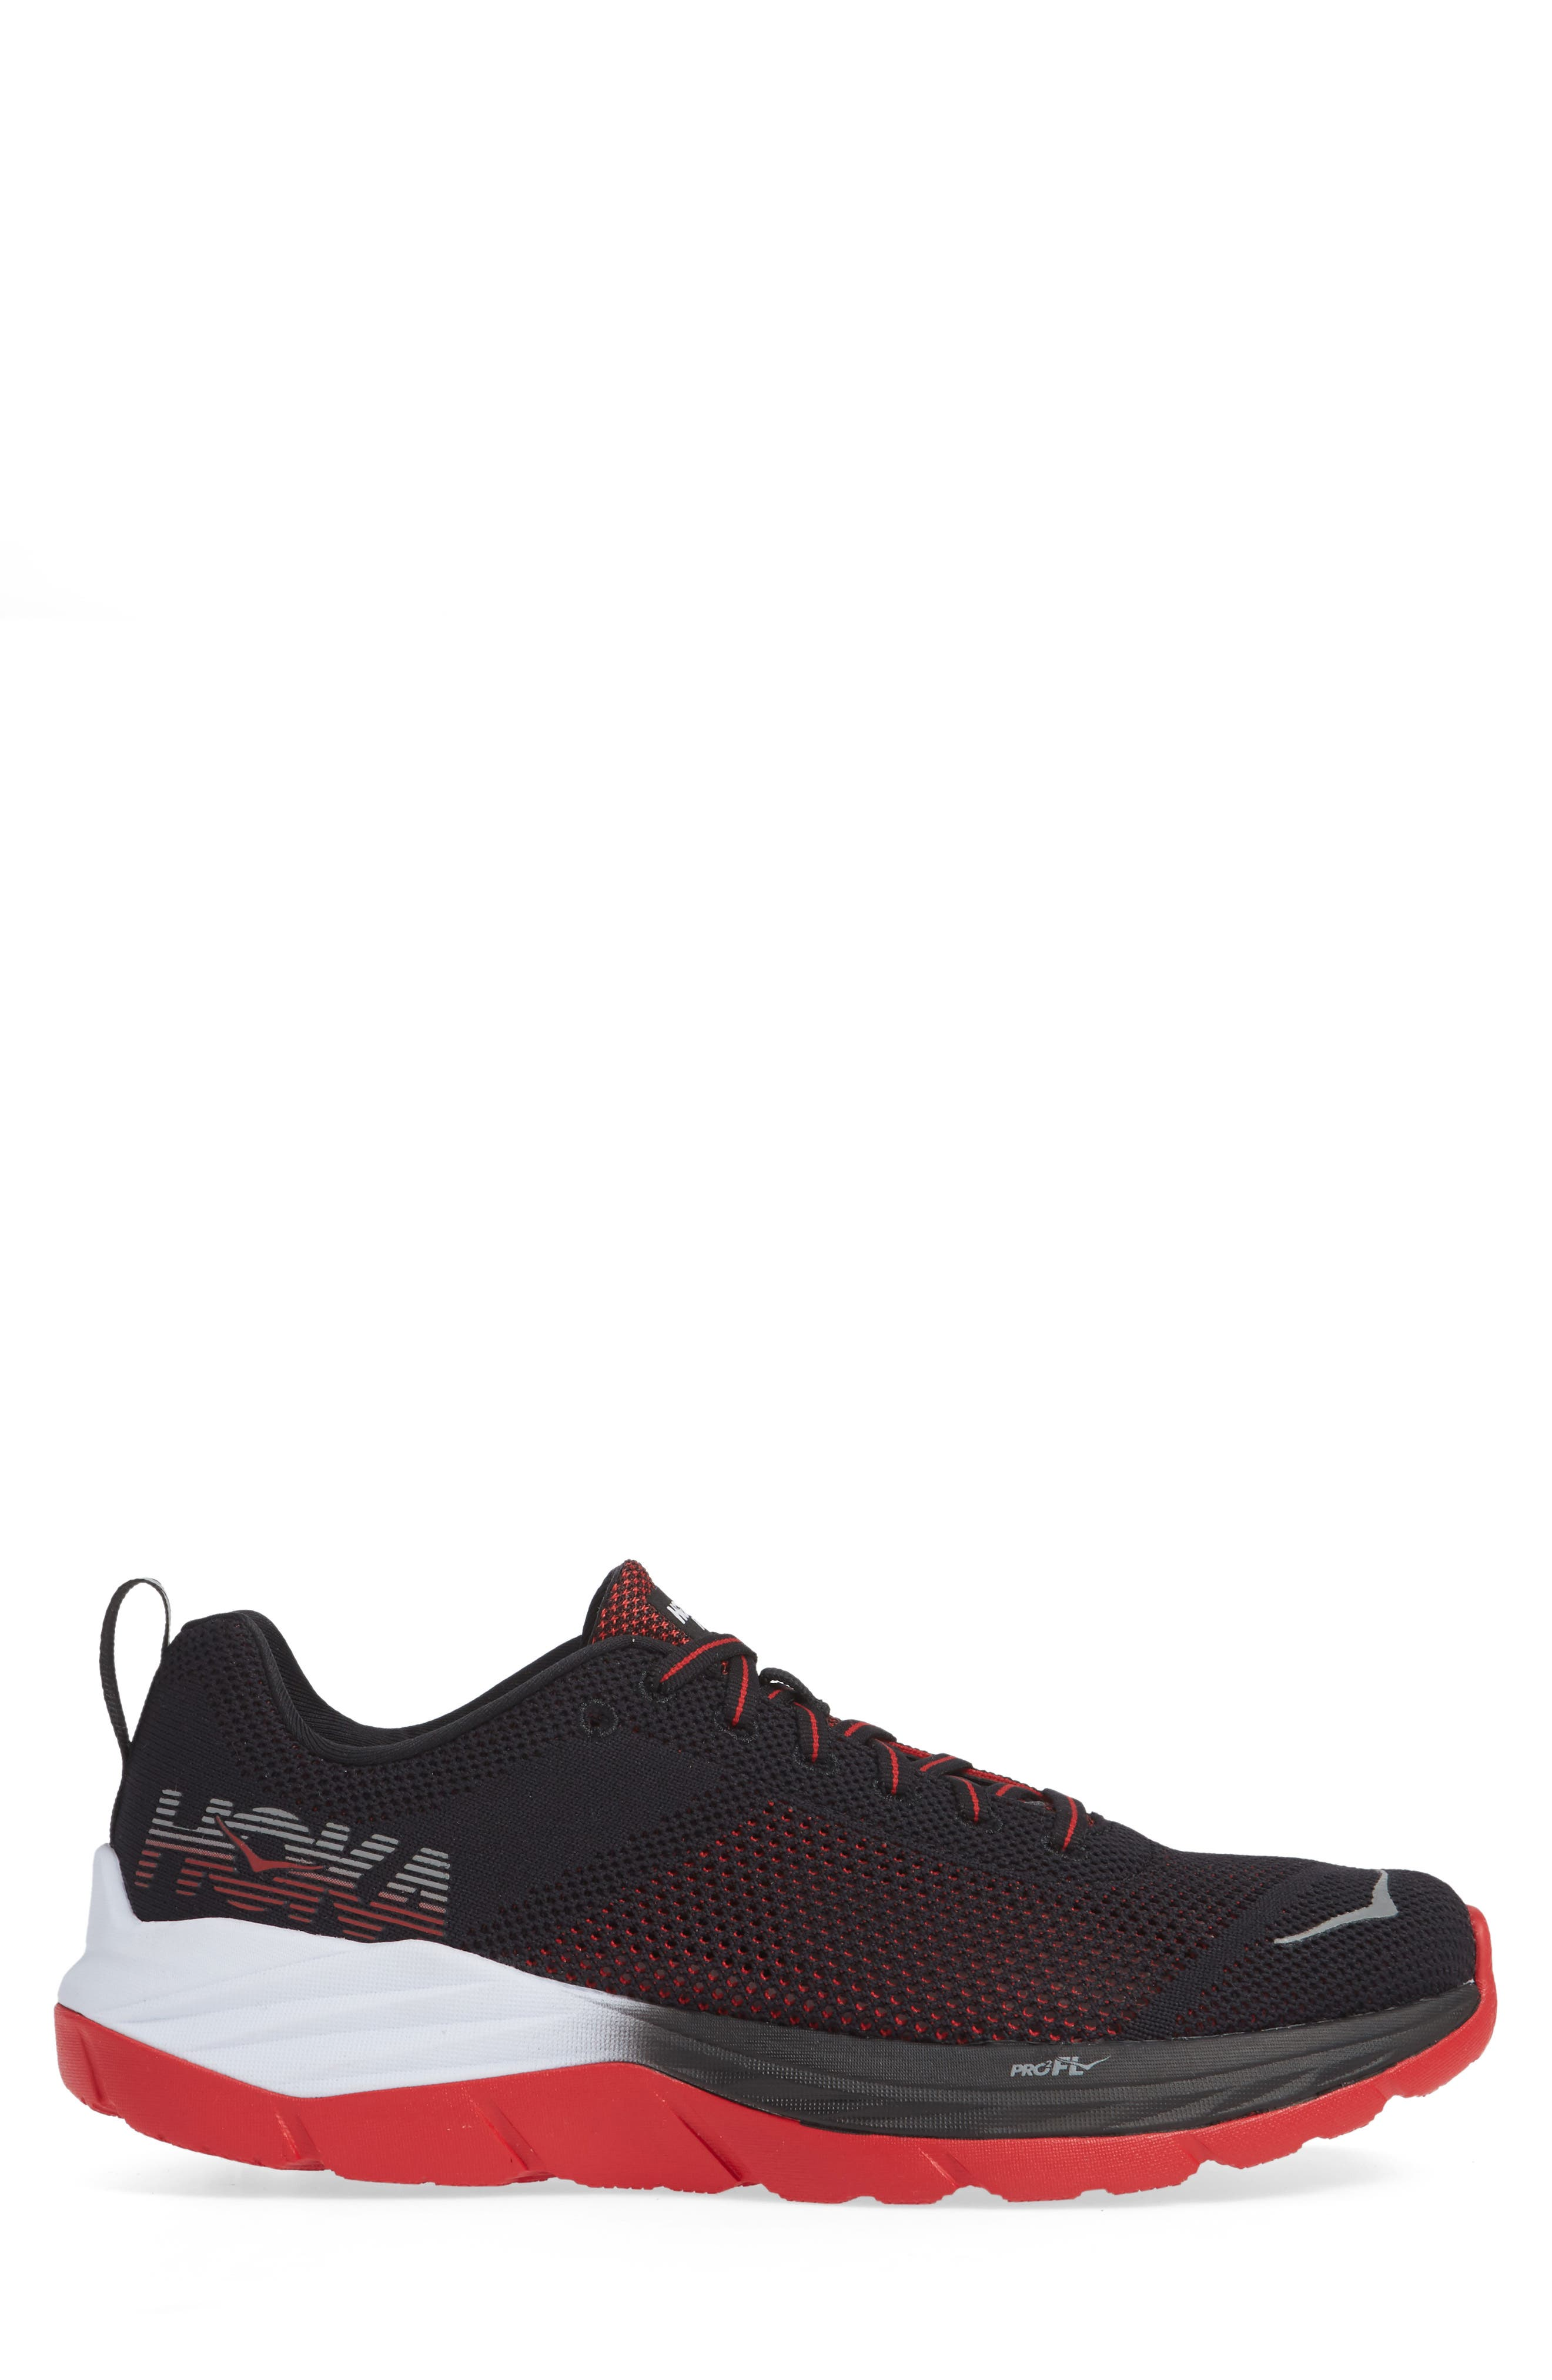 Mach Running Shoe,                             Alternate thumbnail 3, color,                             BLACK/ WHITE